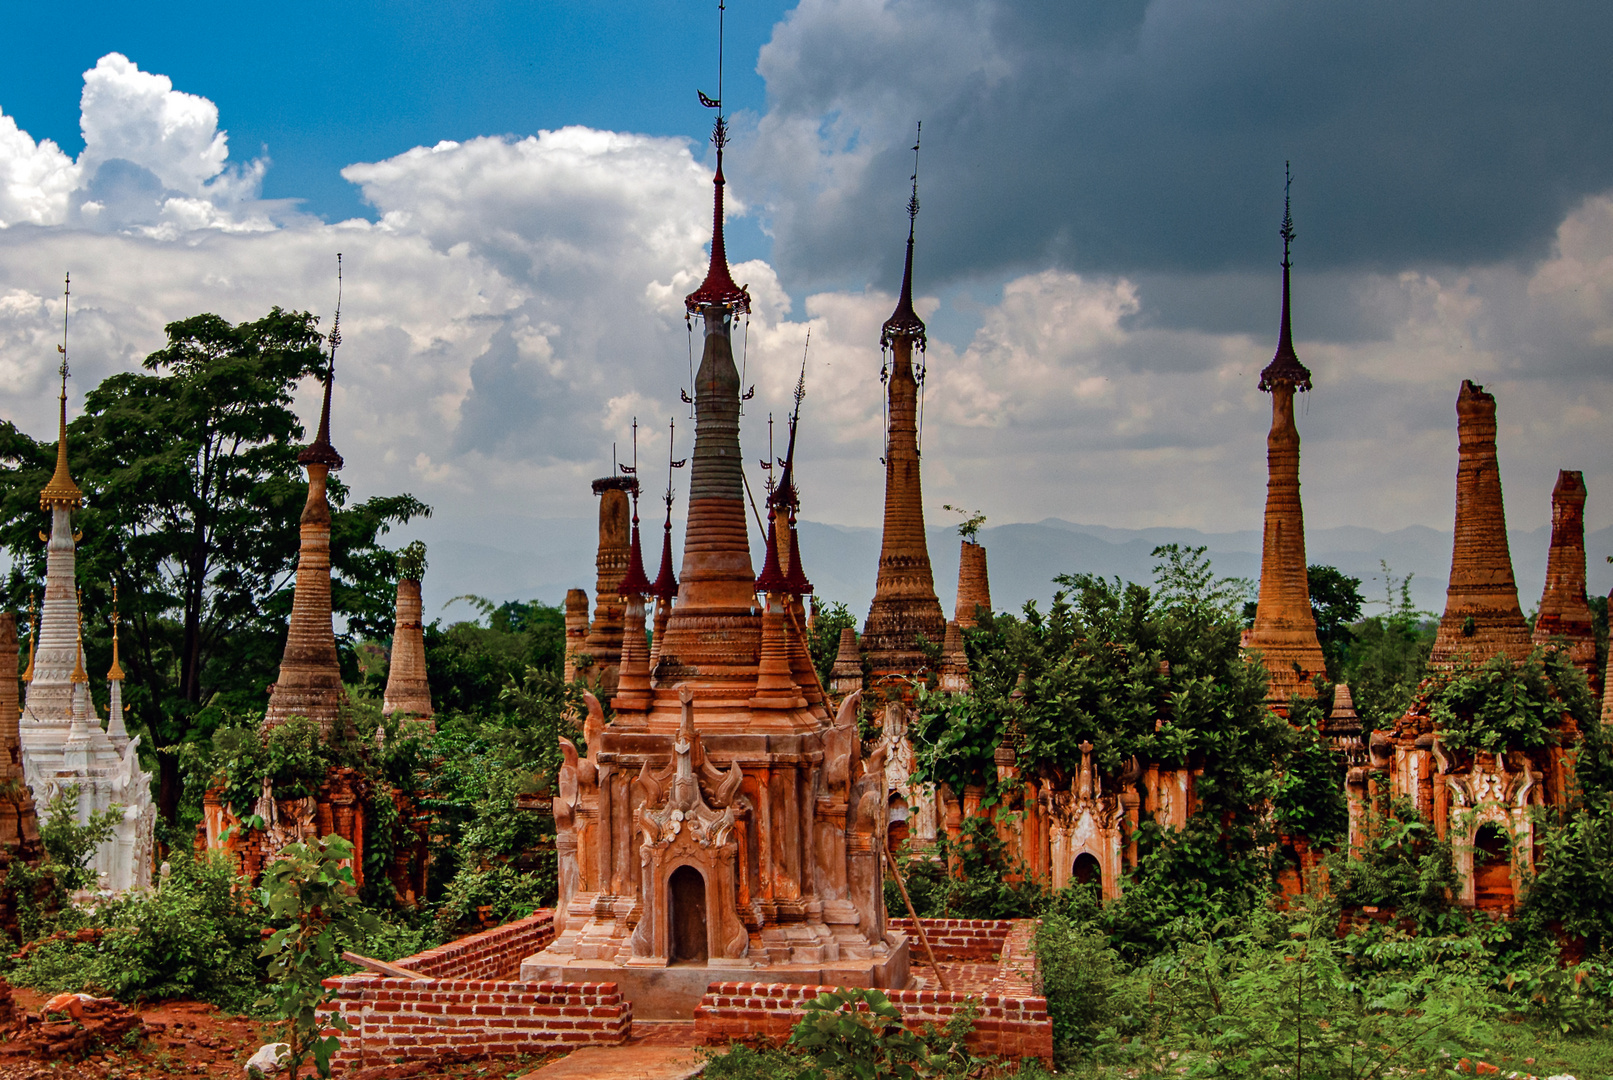 Pagoda forest in Shwe Inn Dein